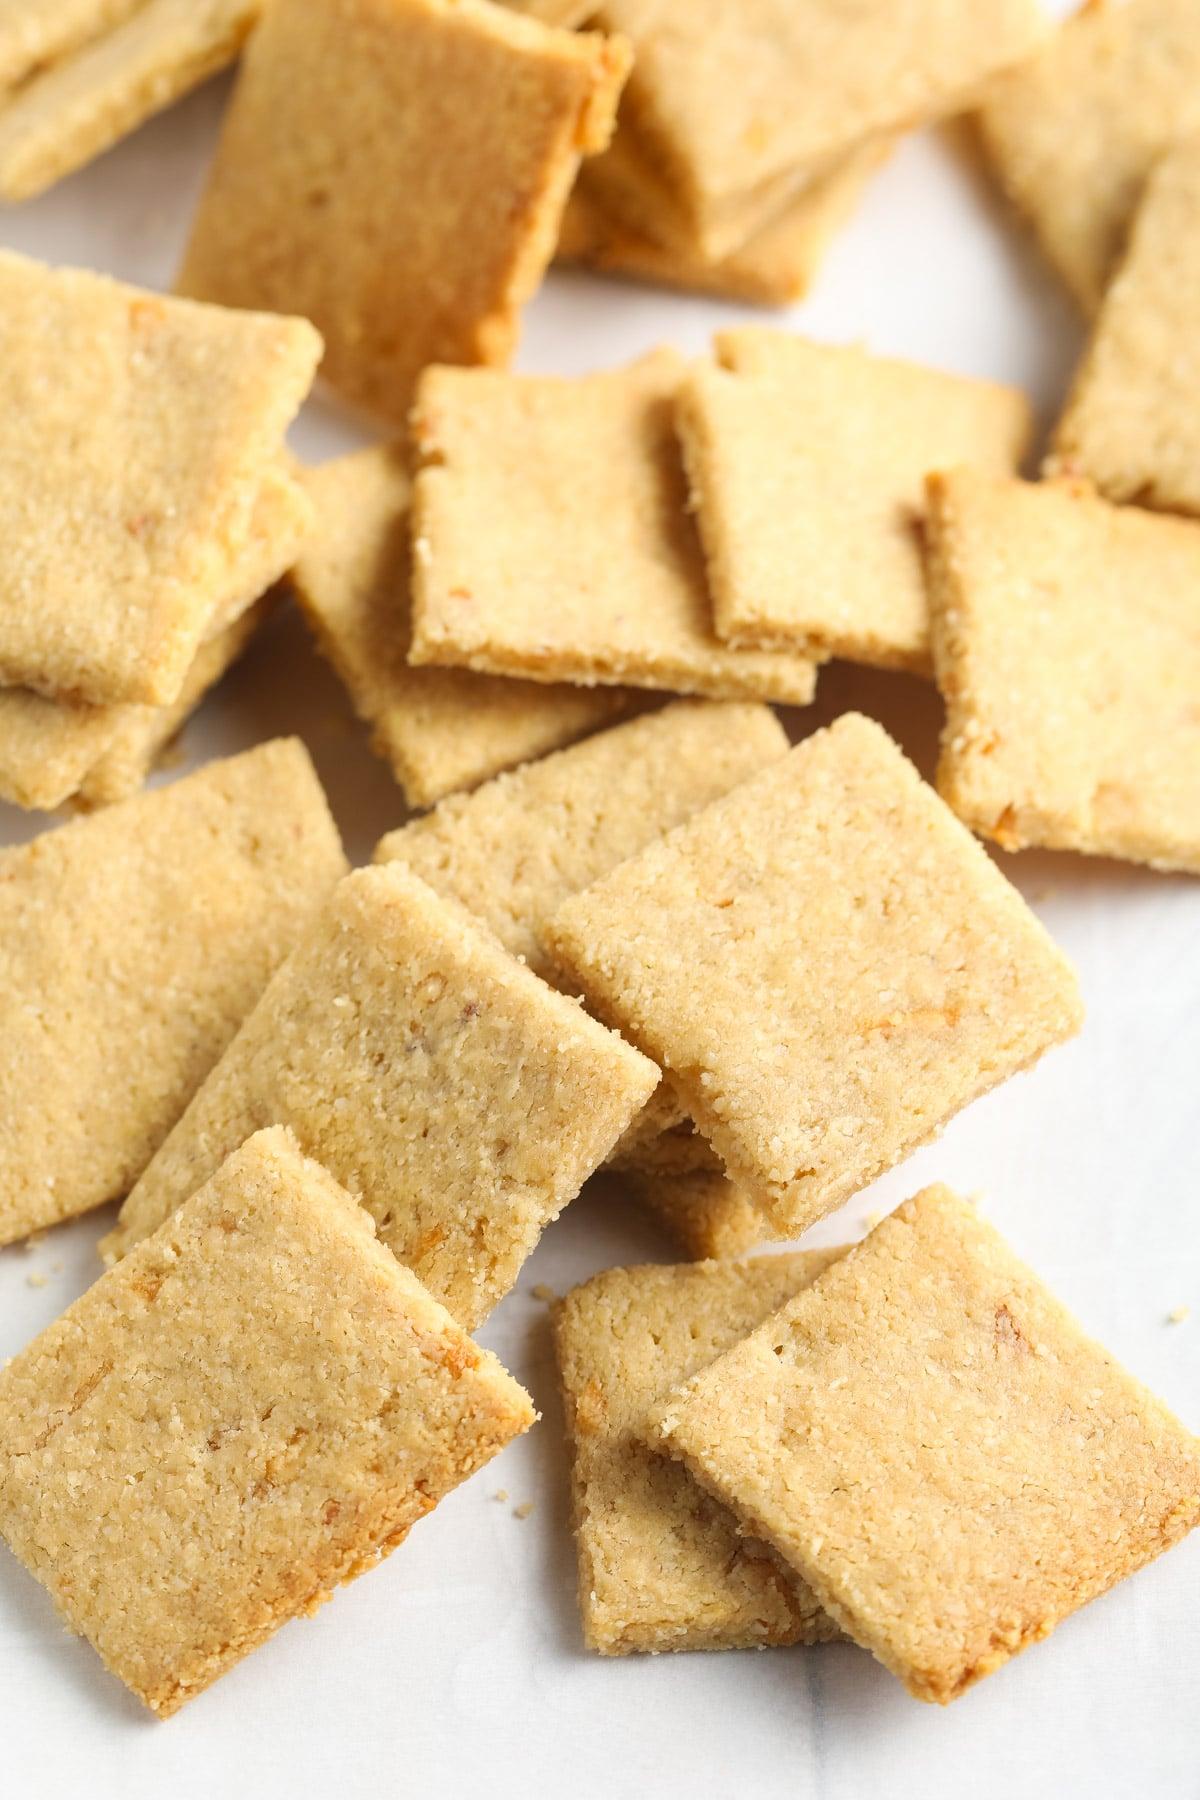 French Onion Keto Cracker Recipe: